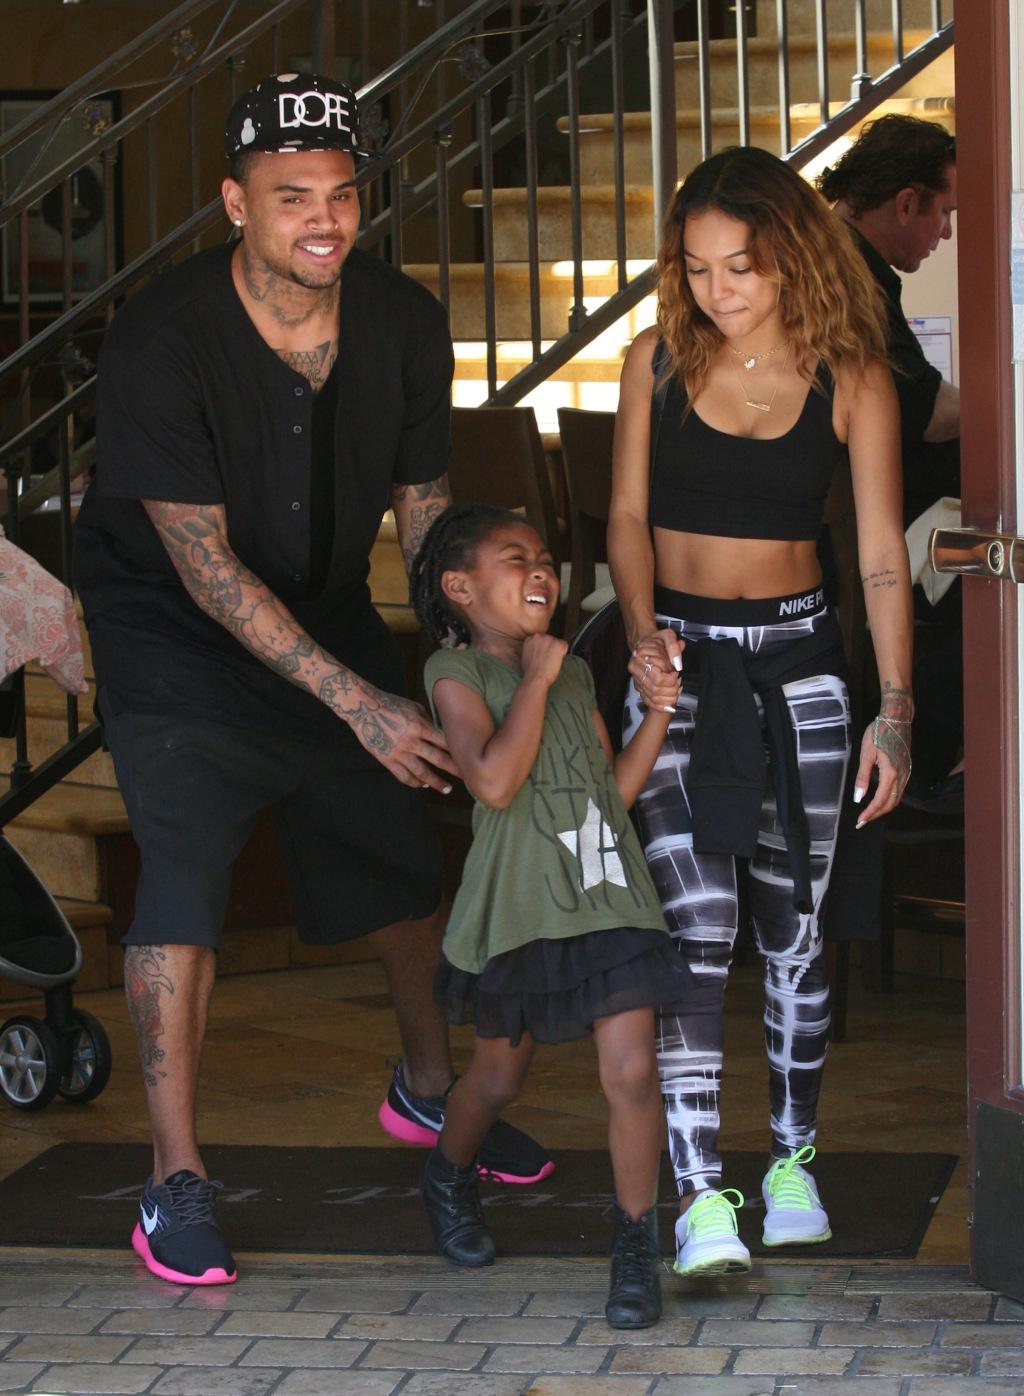 Chris Brown A Father? – www.saidced.com